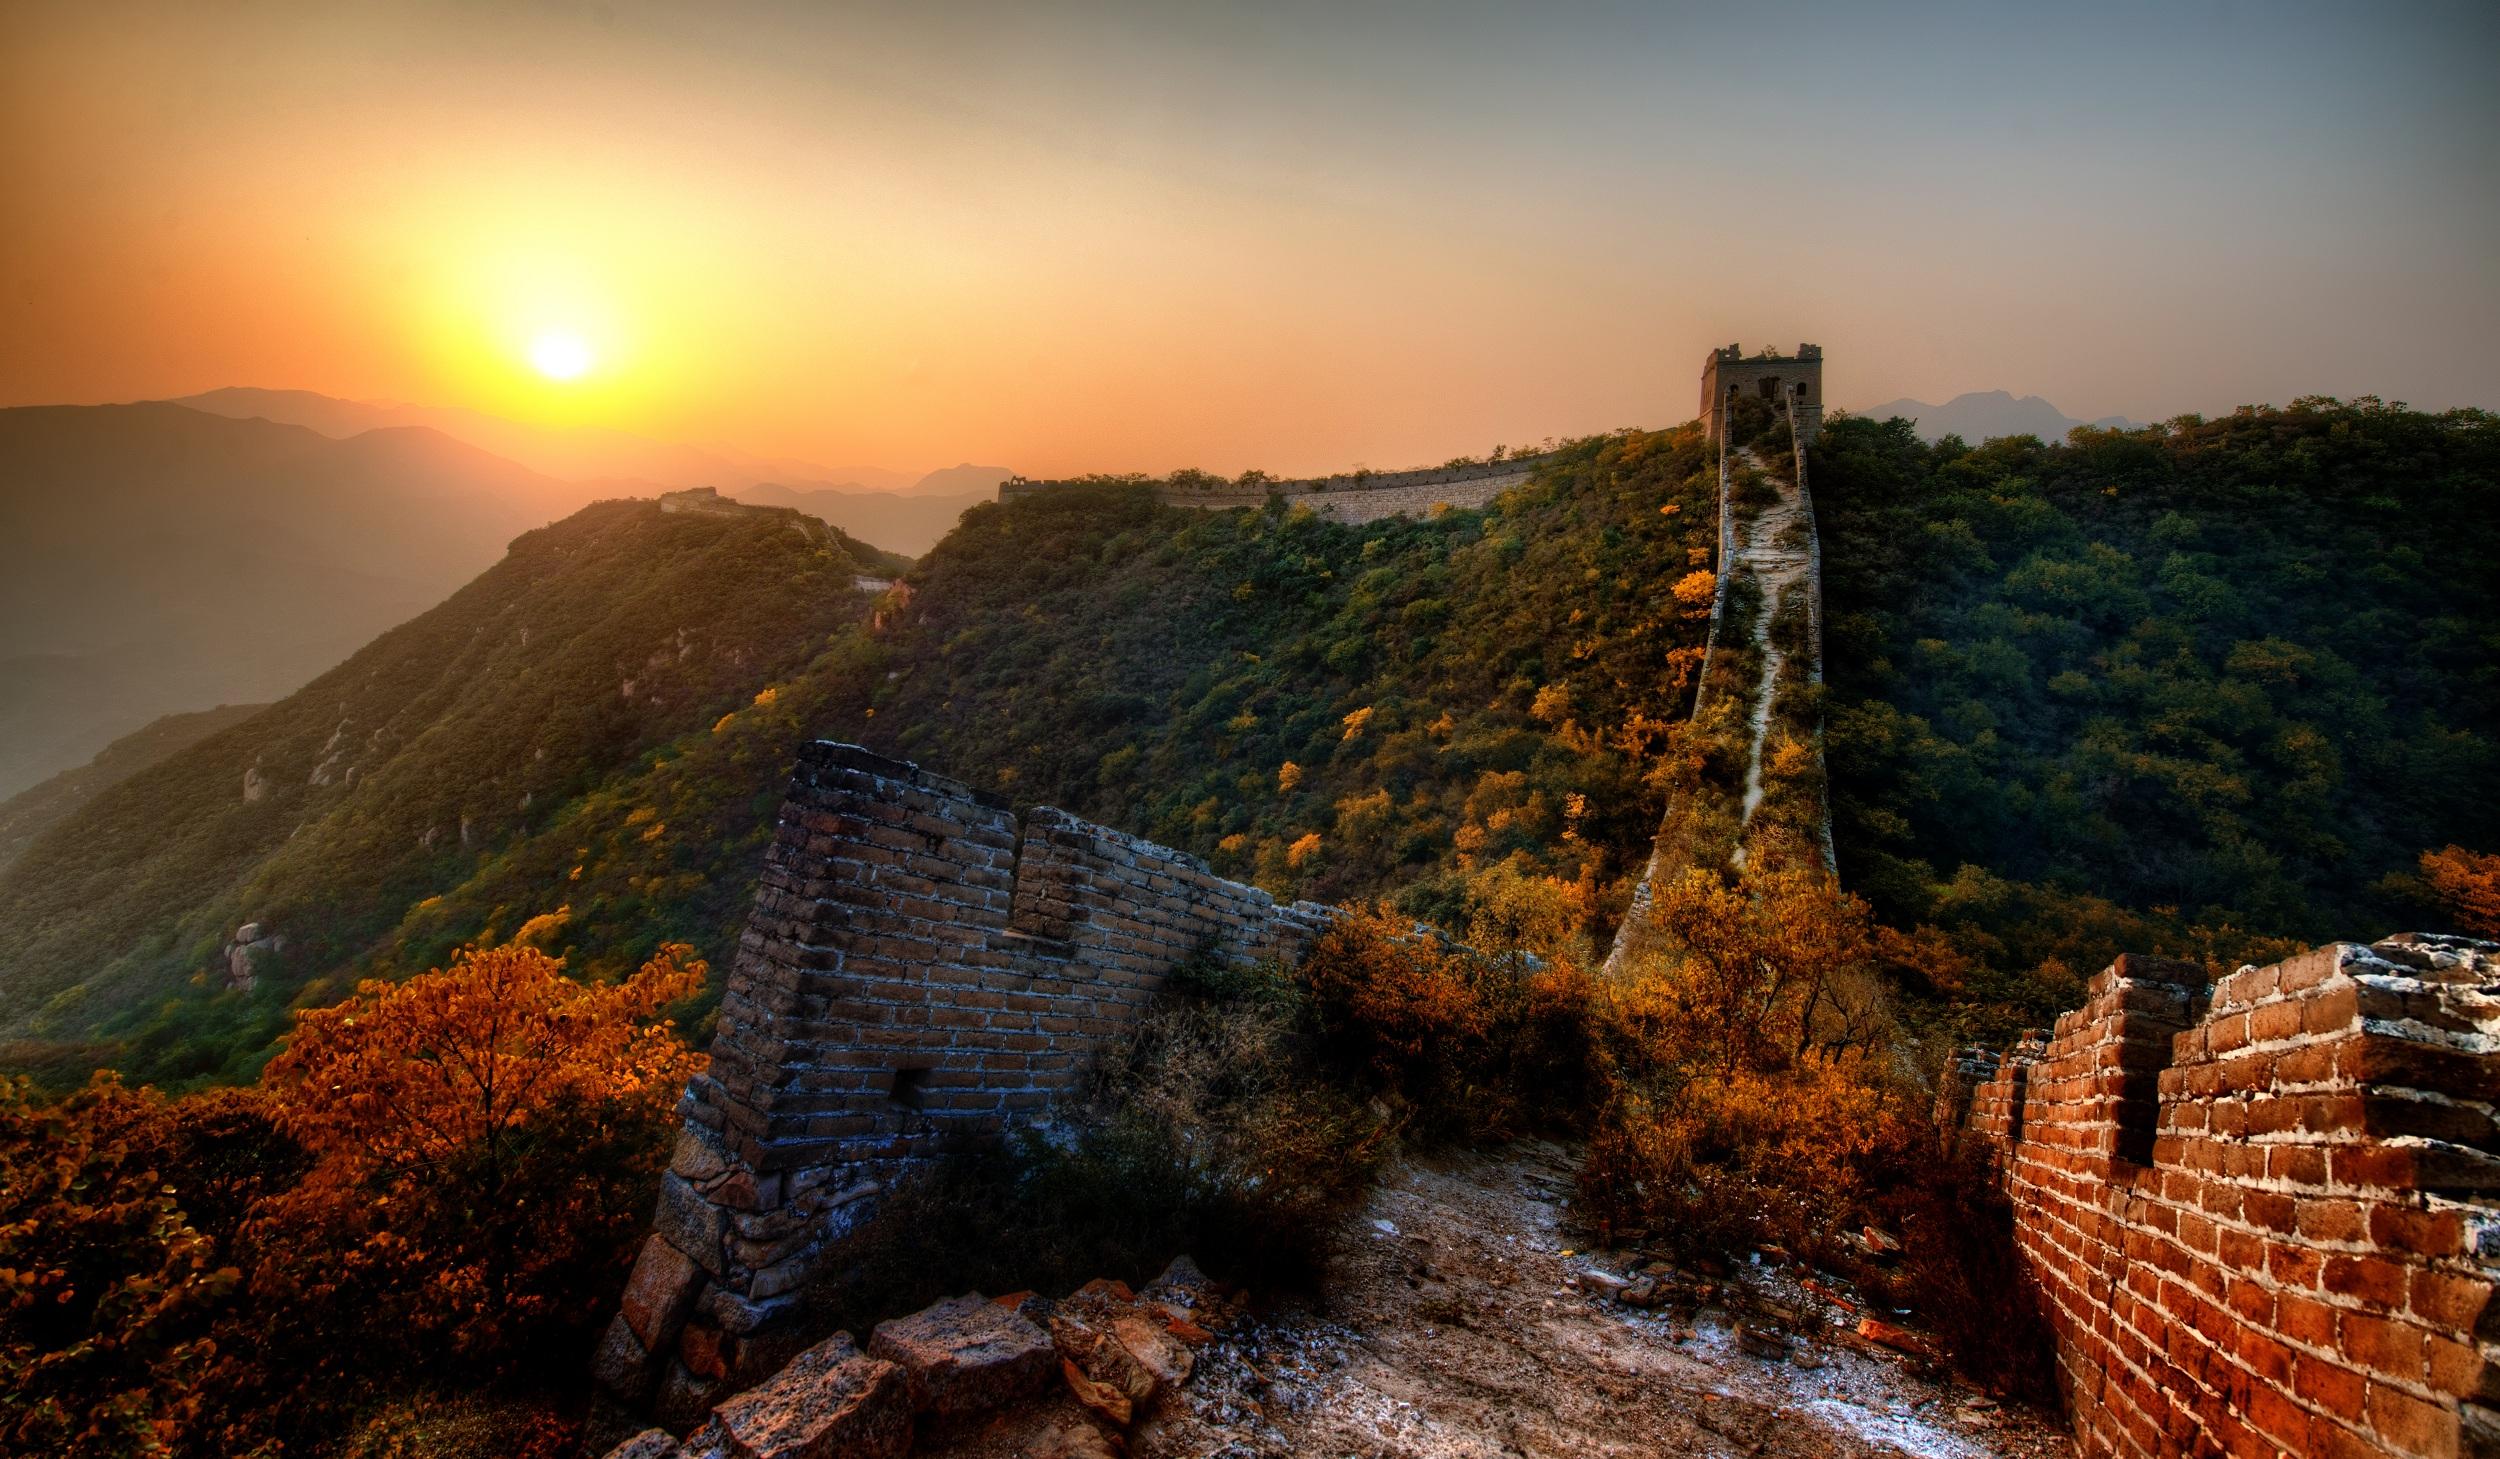 china wall images free download